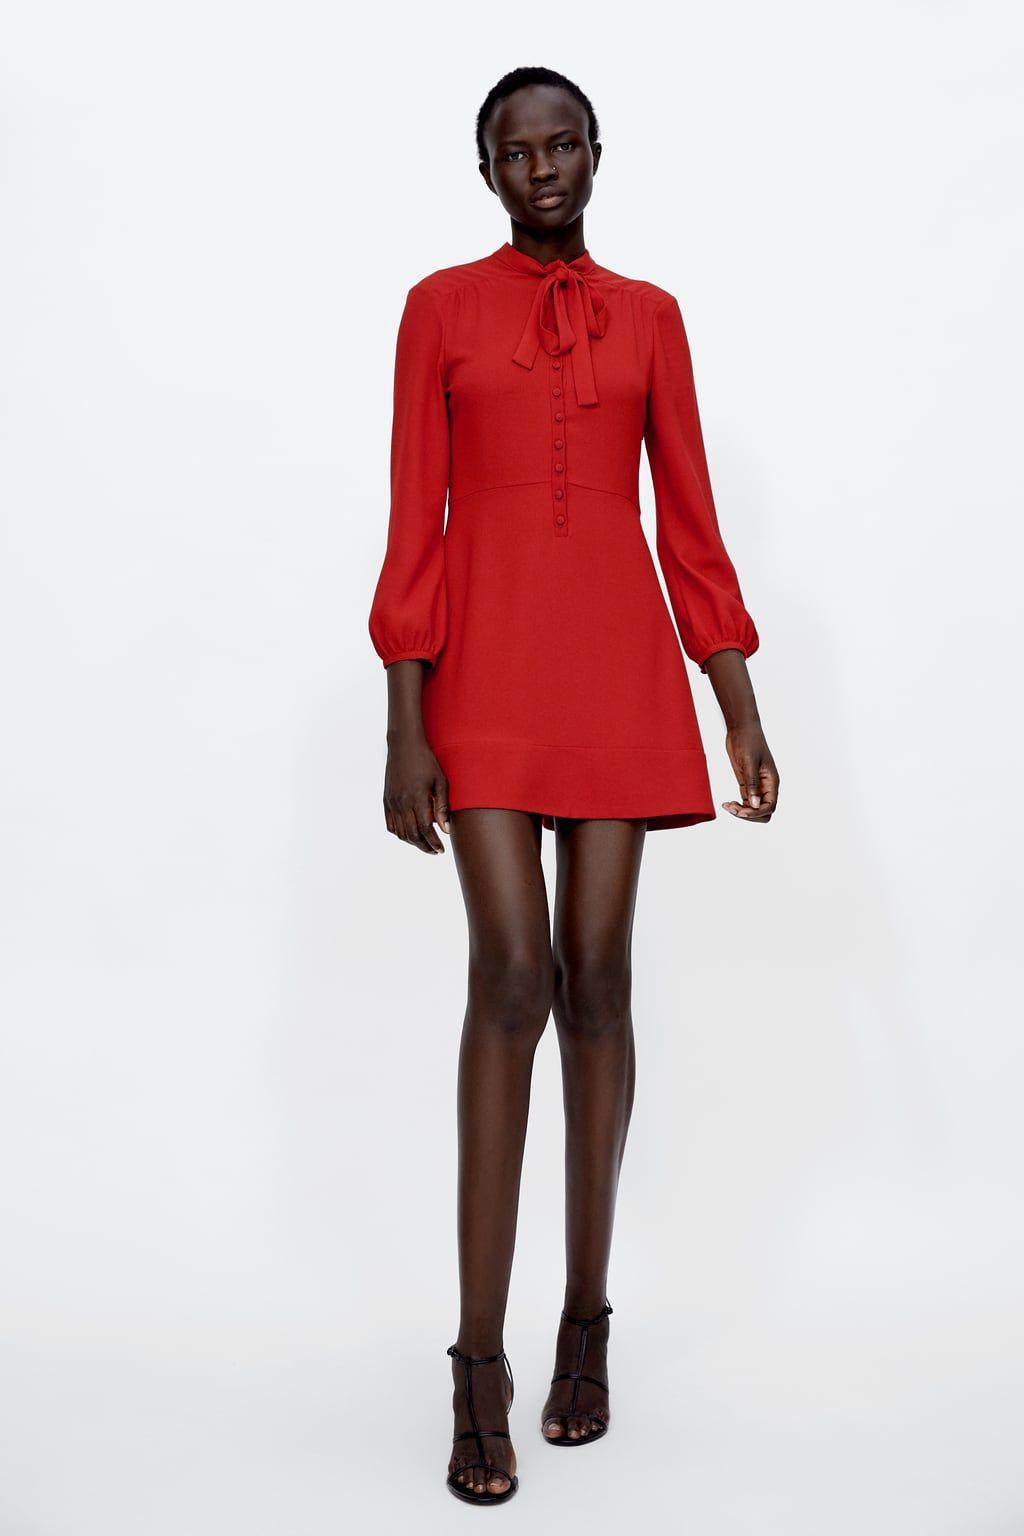 c44ac8e6 VESTIDO MINI LAZO. VESTIDO MINI LAZO Zara Red Dress, Zara Dresses ...